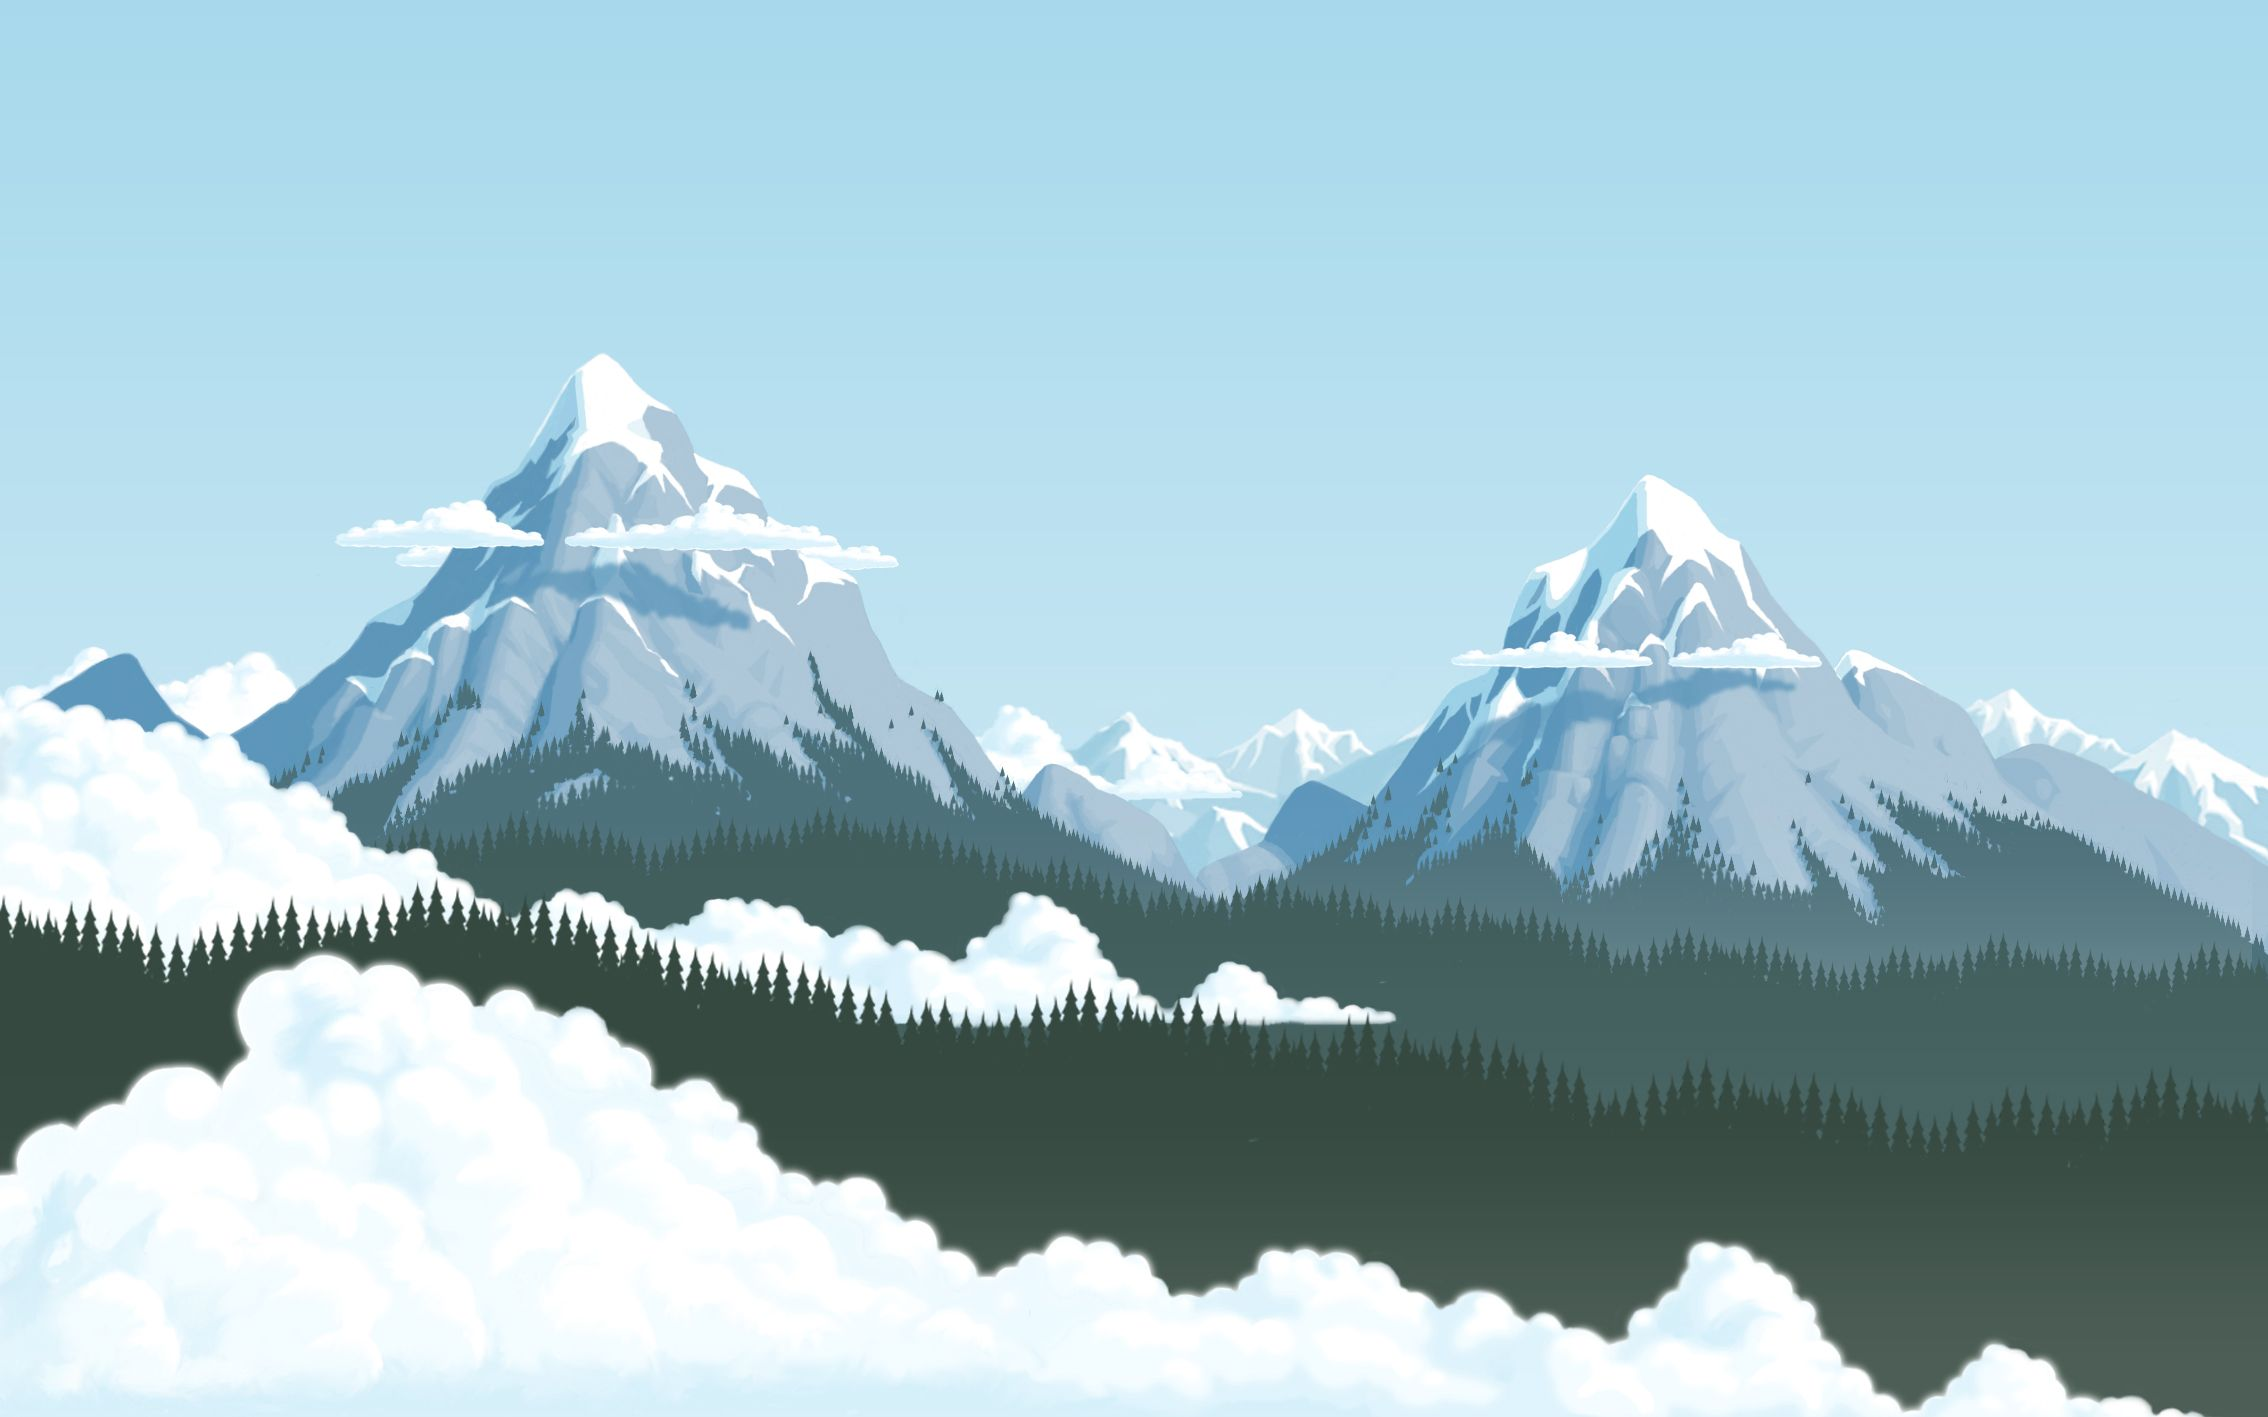 Great Wallpaper Mountain Art - 5723c2a872fc7697bbd70fad6e571502  Graphic_74421.jpg